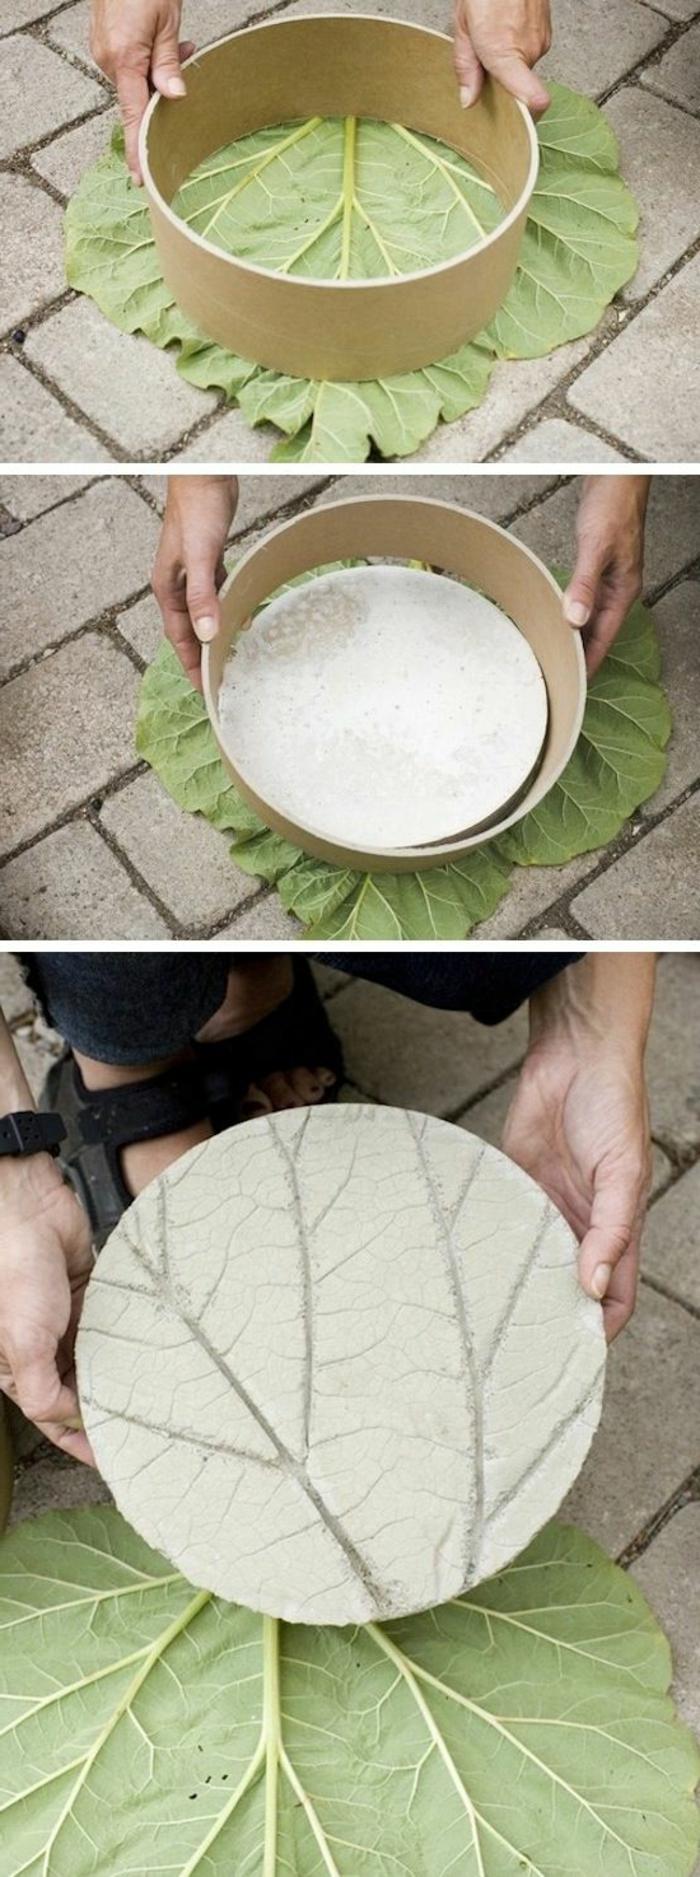 baton deko - diy gartendeko aus zement mit großem baumblatt dekorieren